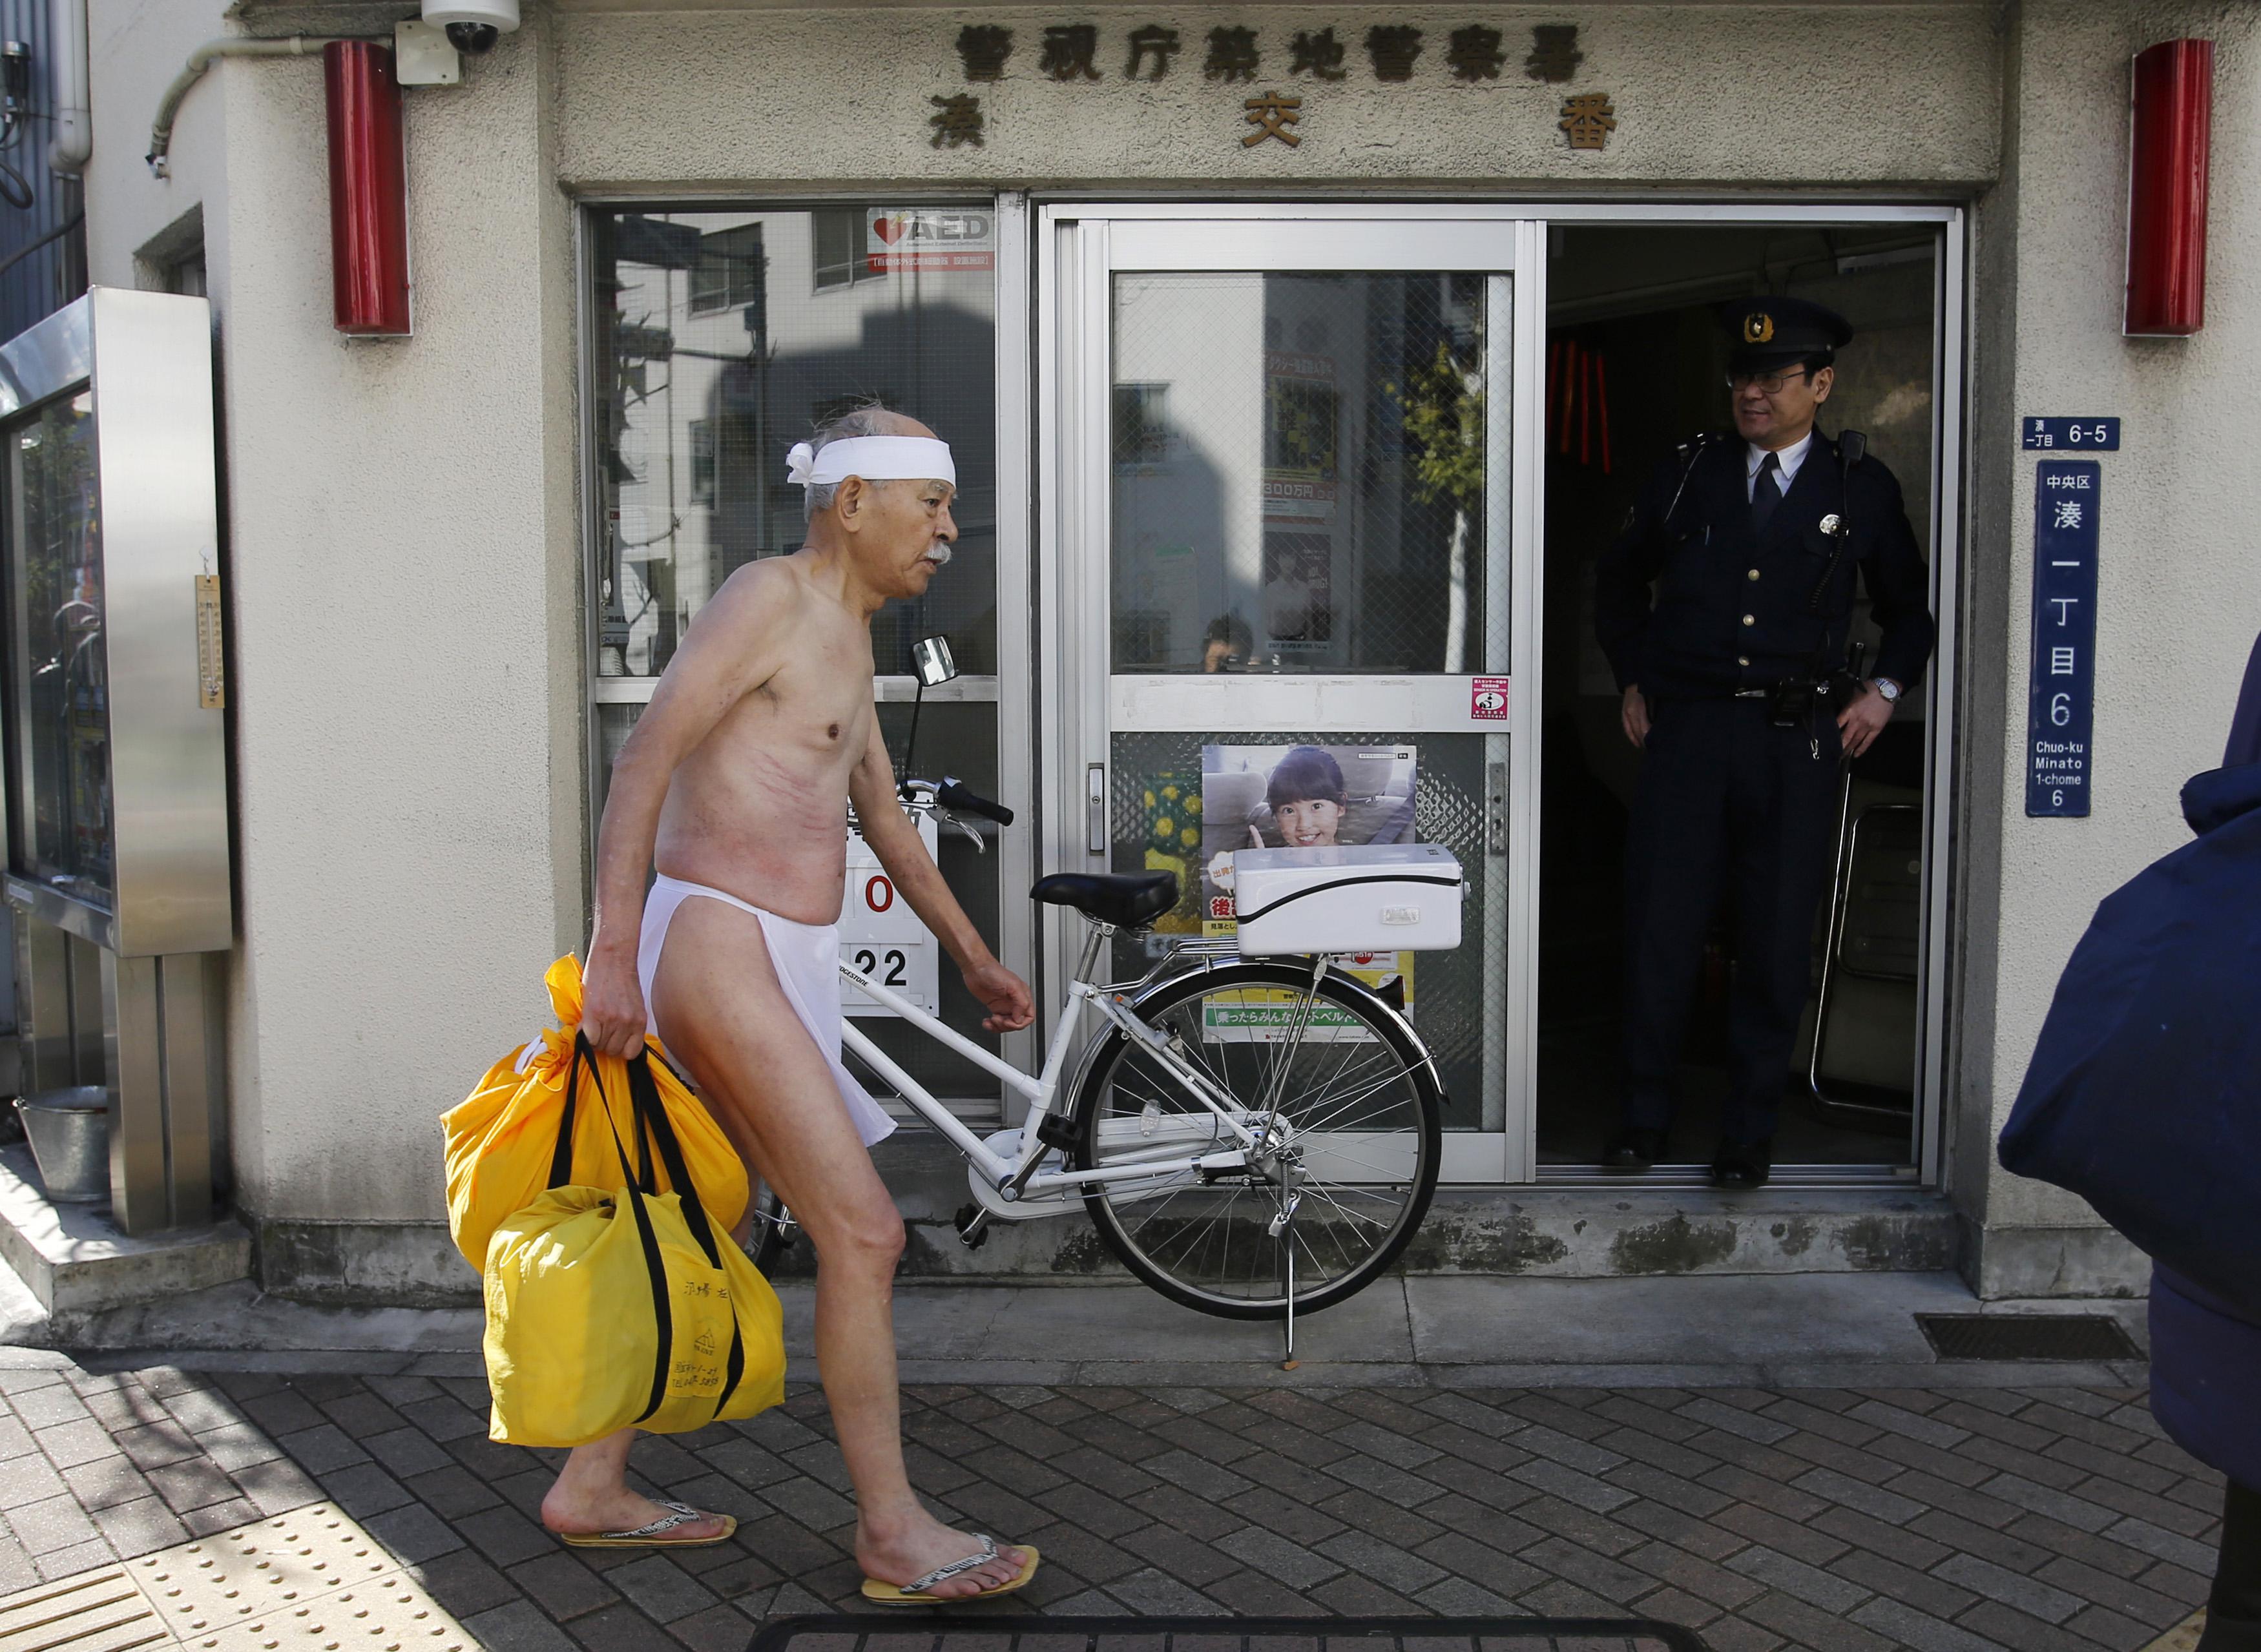 A Japanese man on his way to take a (Shinto ritual) bath in a loin cloth.